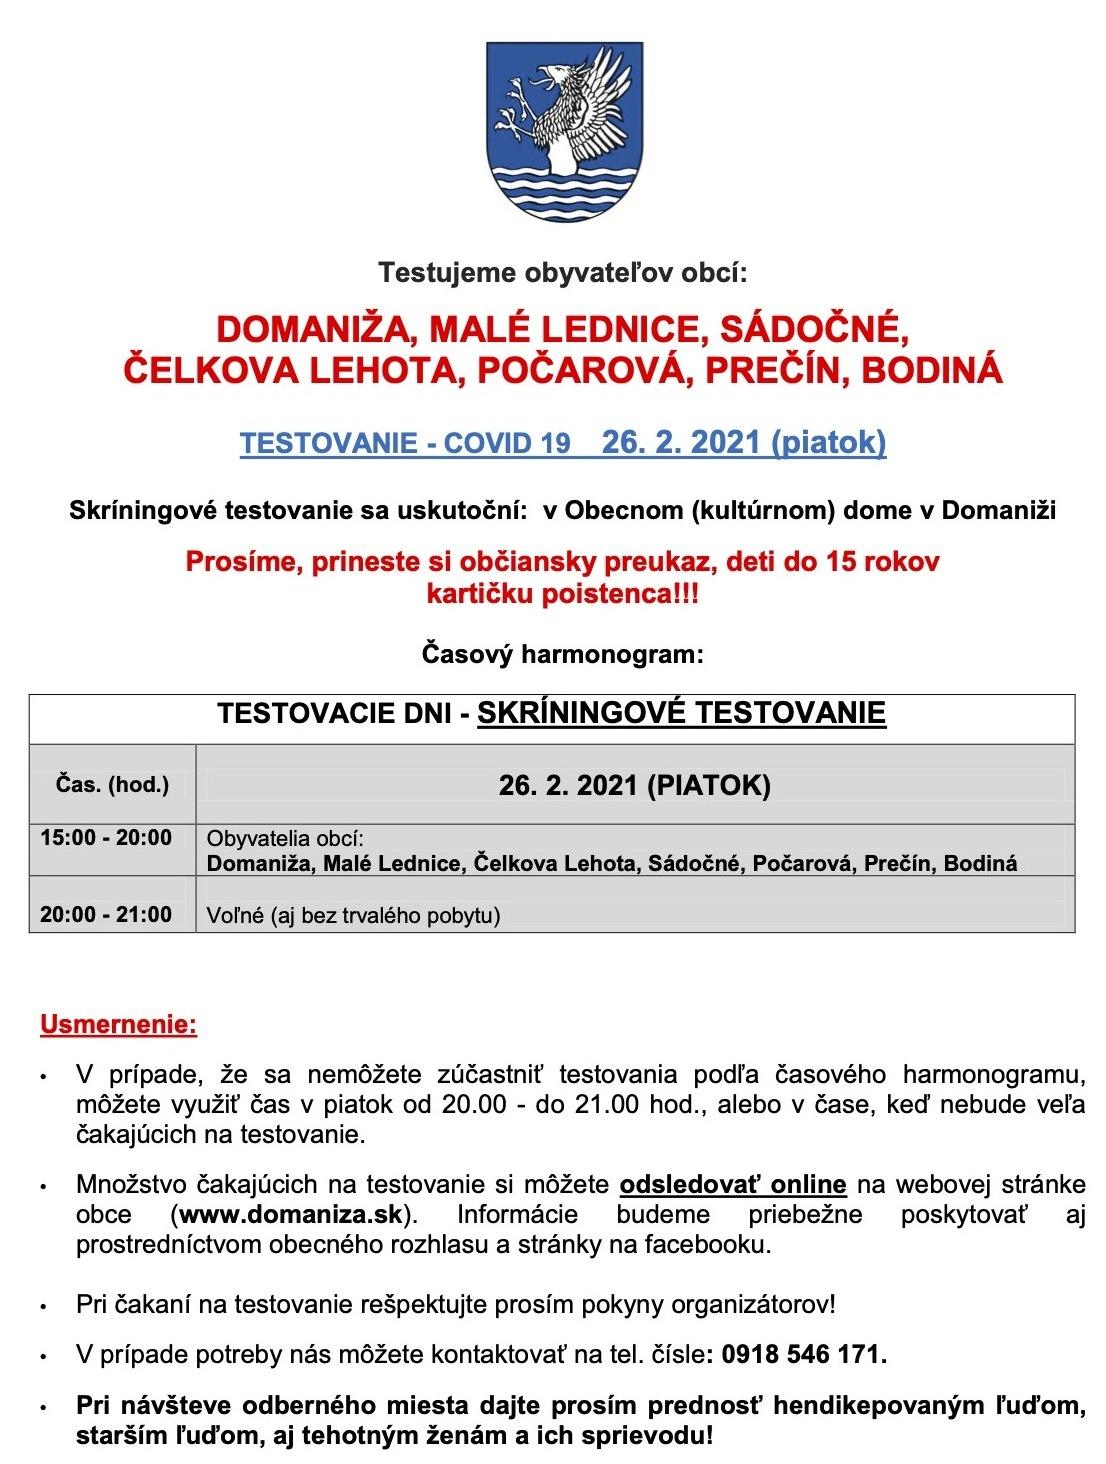 Domaniza-skriningove-testovanie-2021-8.jpg